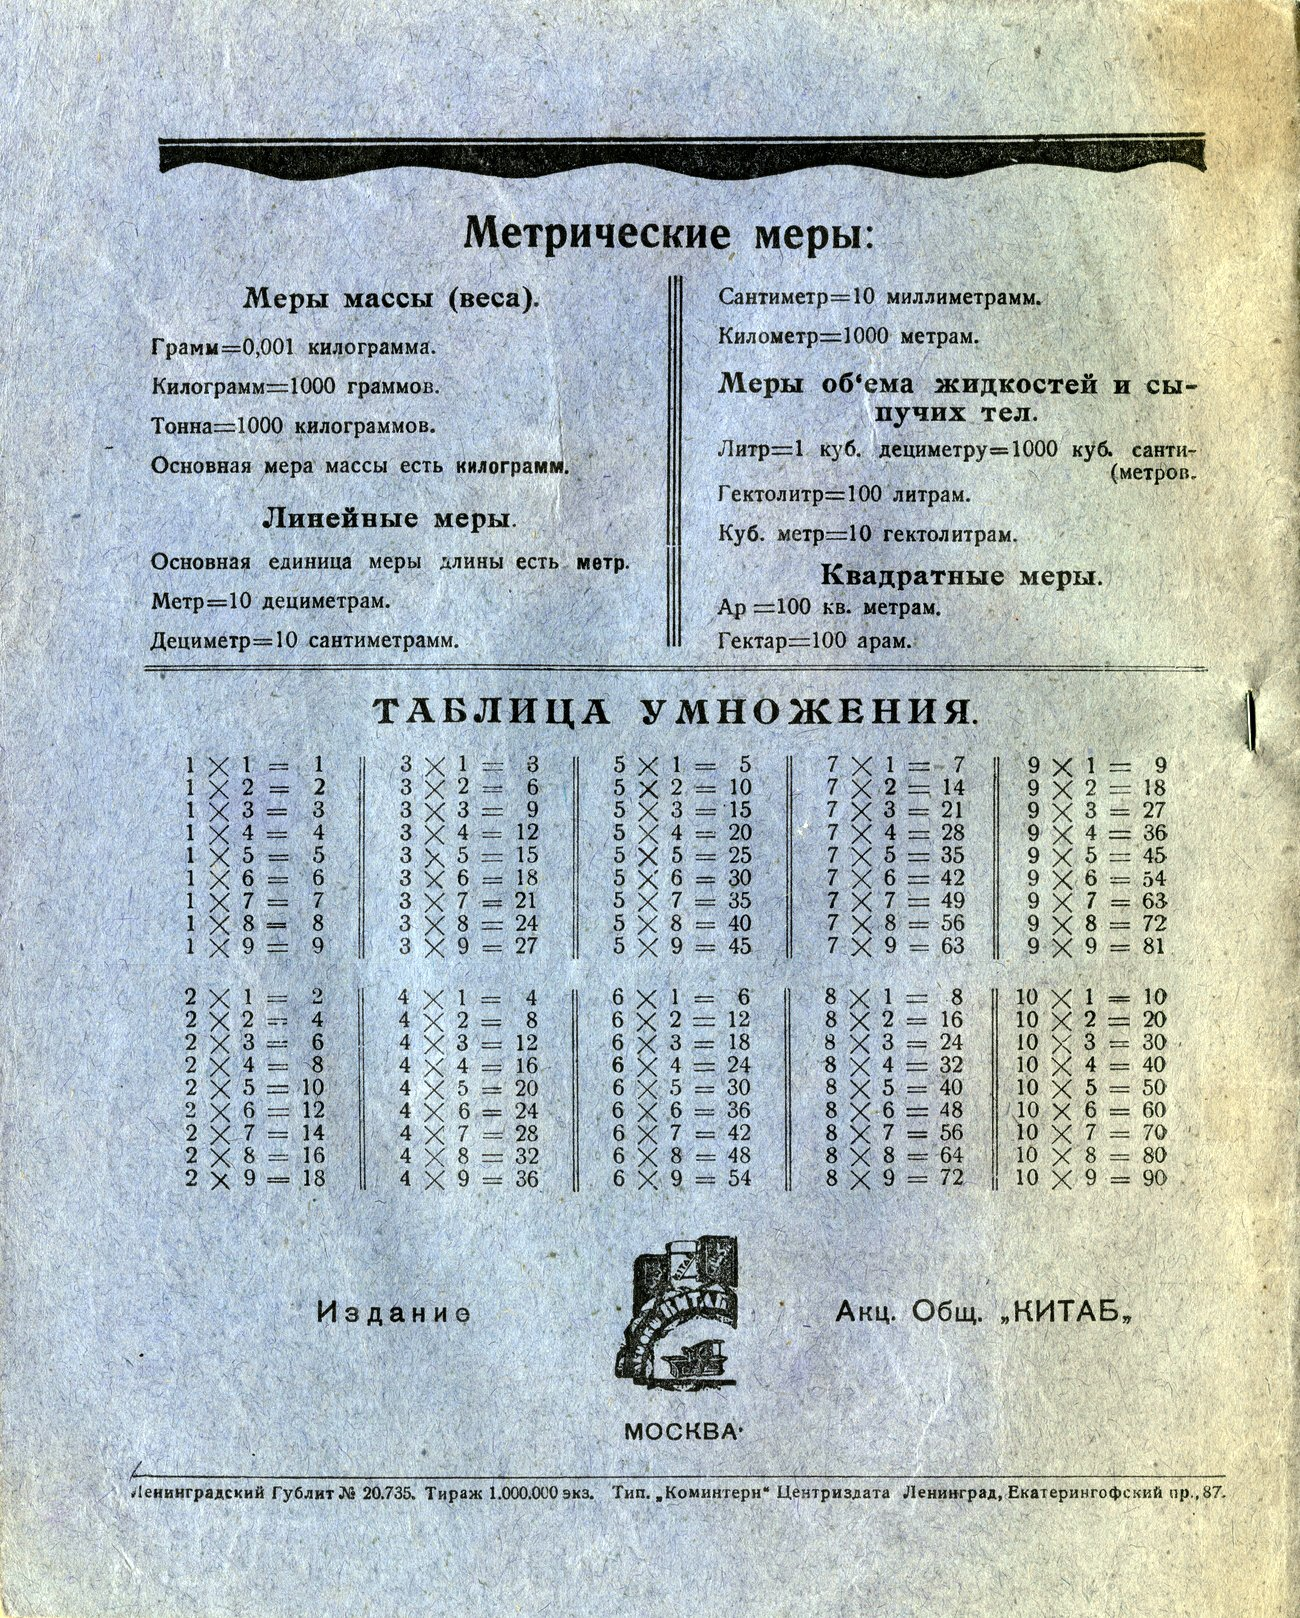 Тетрадь издательство КИТАБ, 175х220, оборот